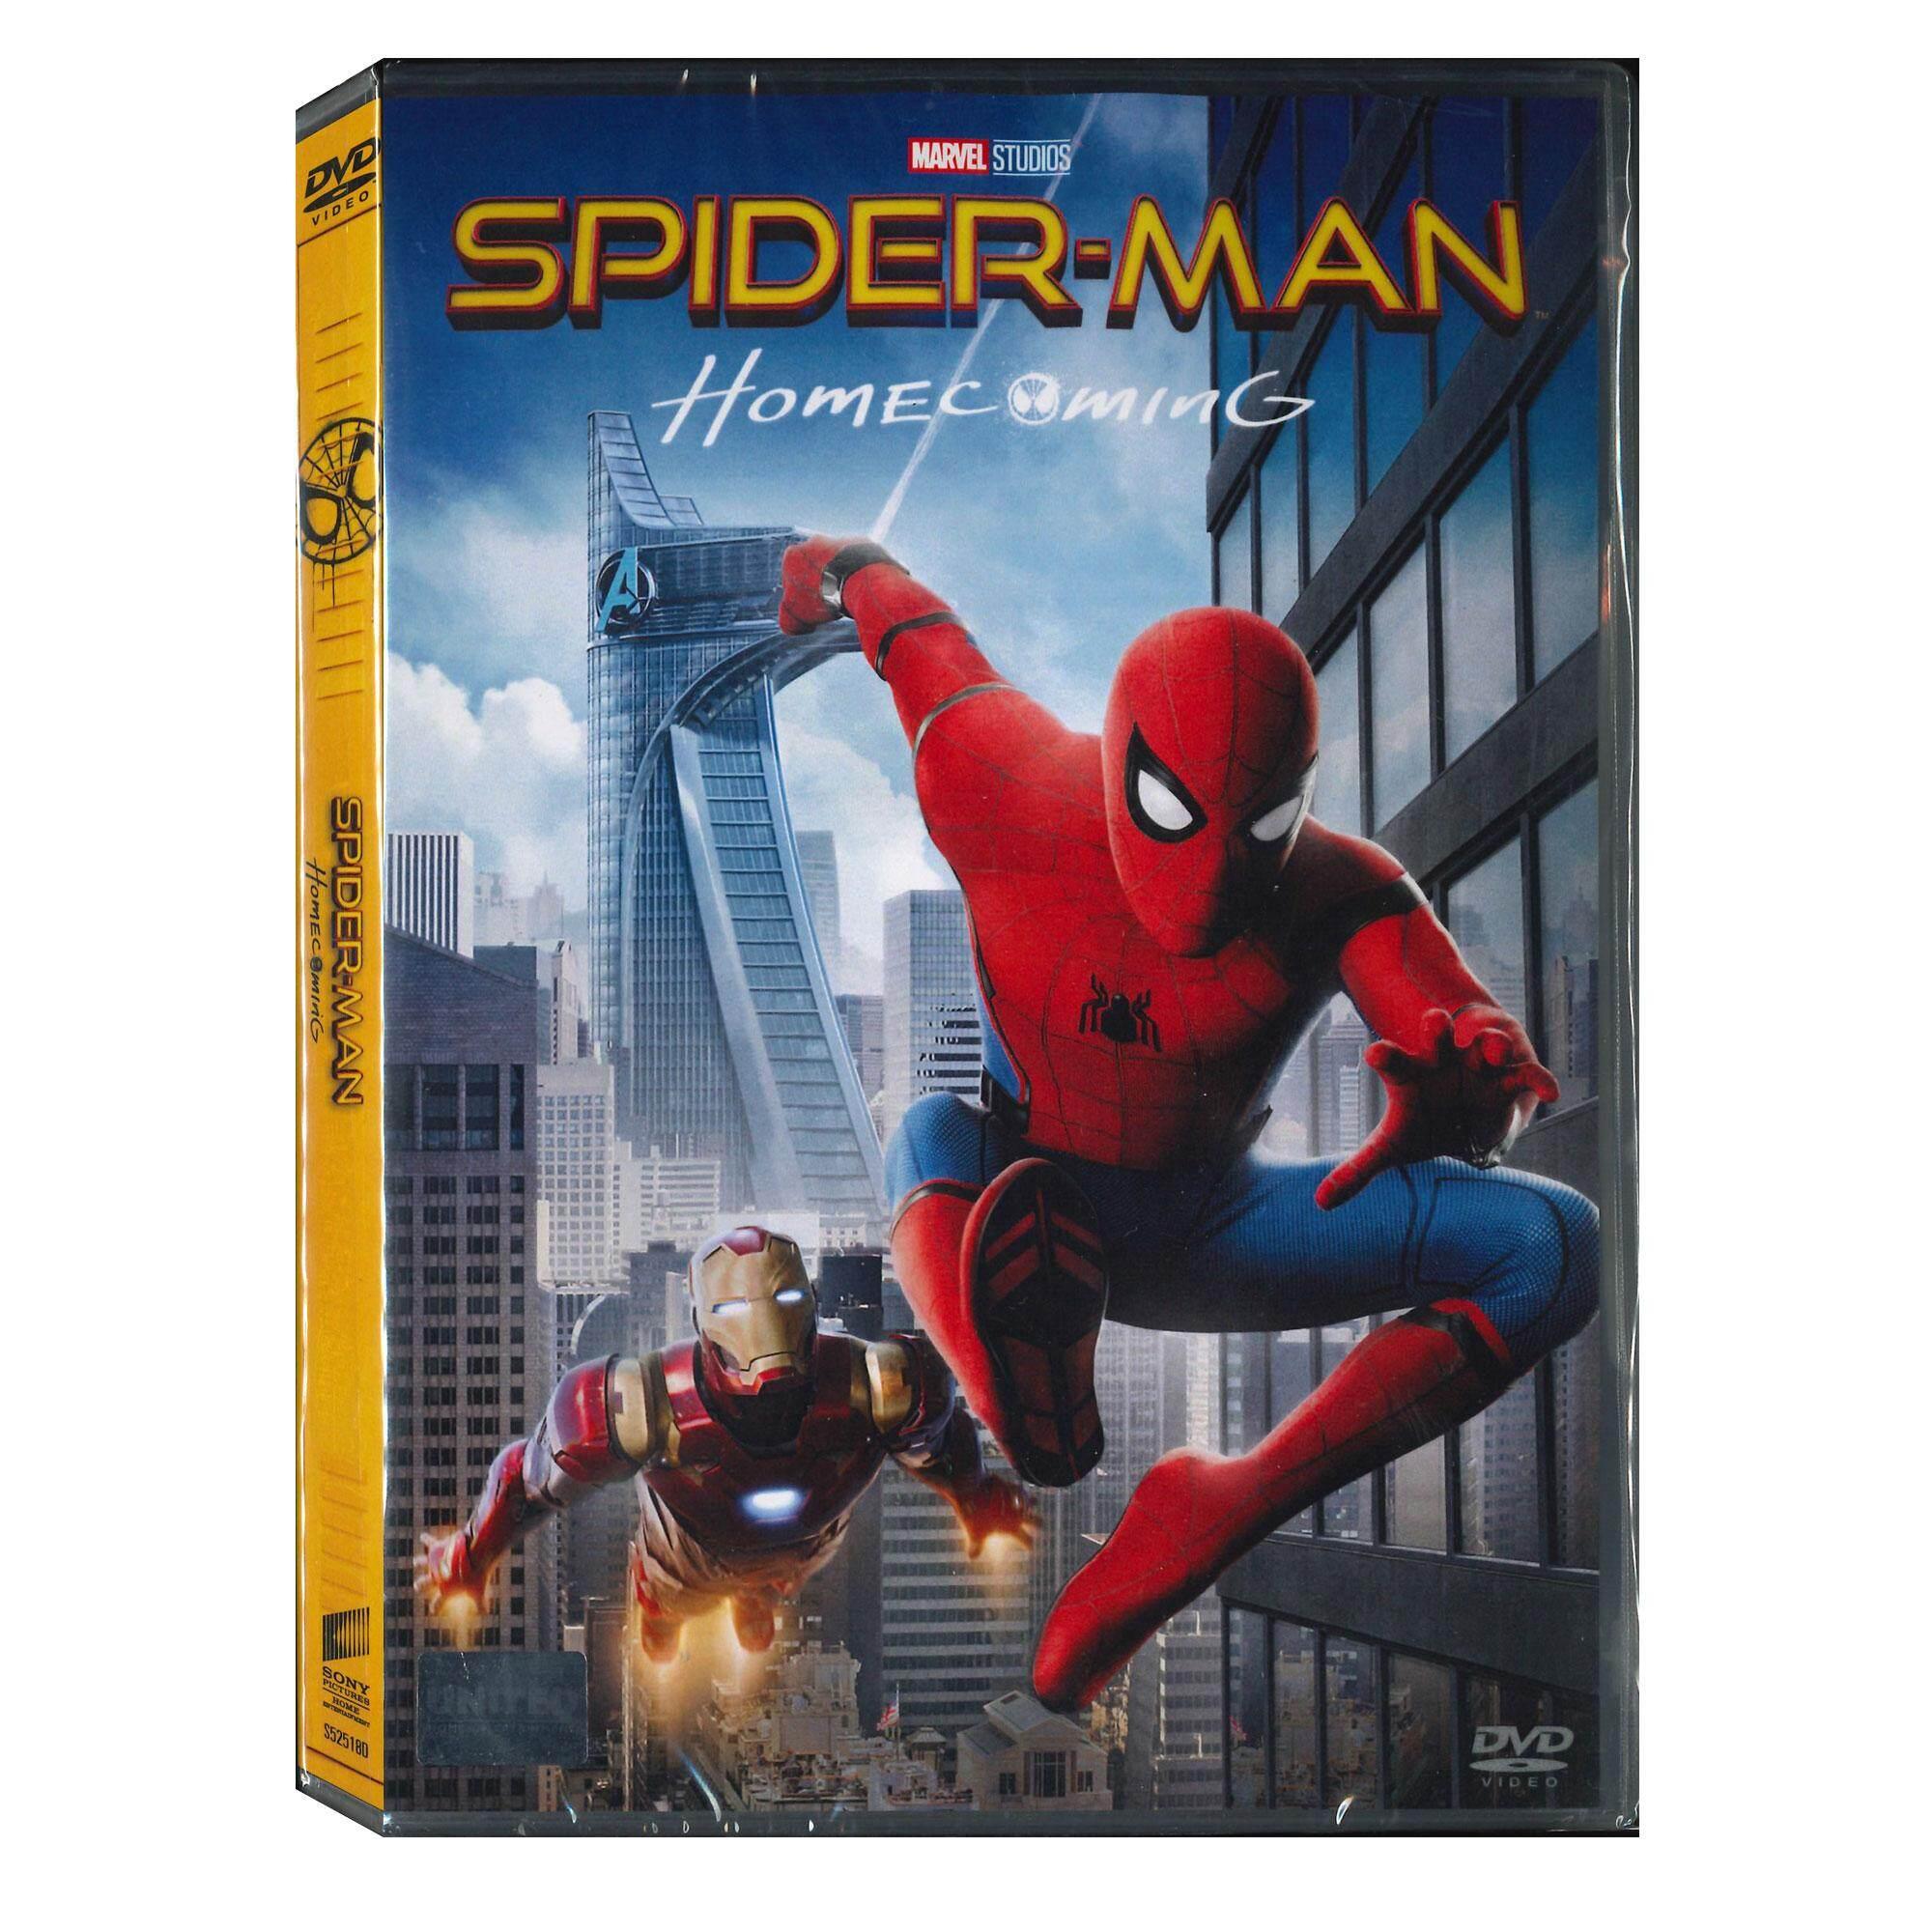 Media Play Spider-Man: Homecoming/สไปเดอร์แมน โฮมคัมมิ่ง (dvd).